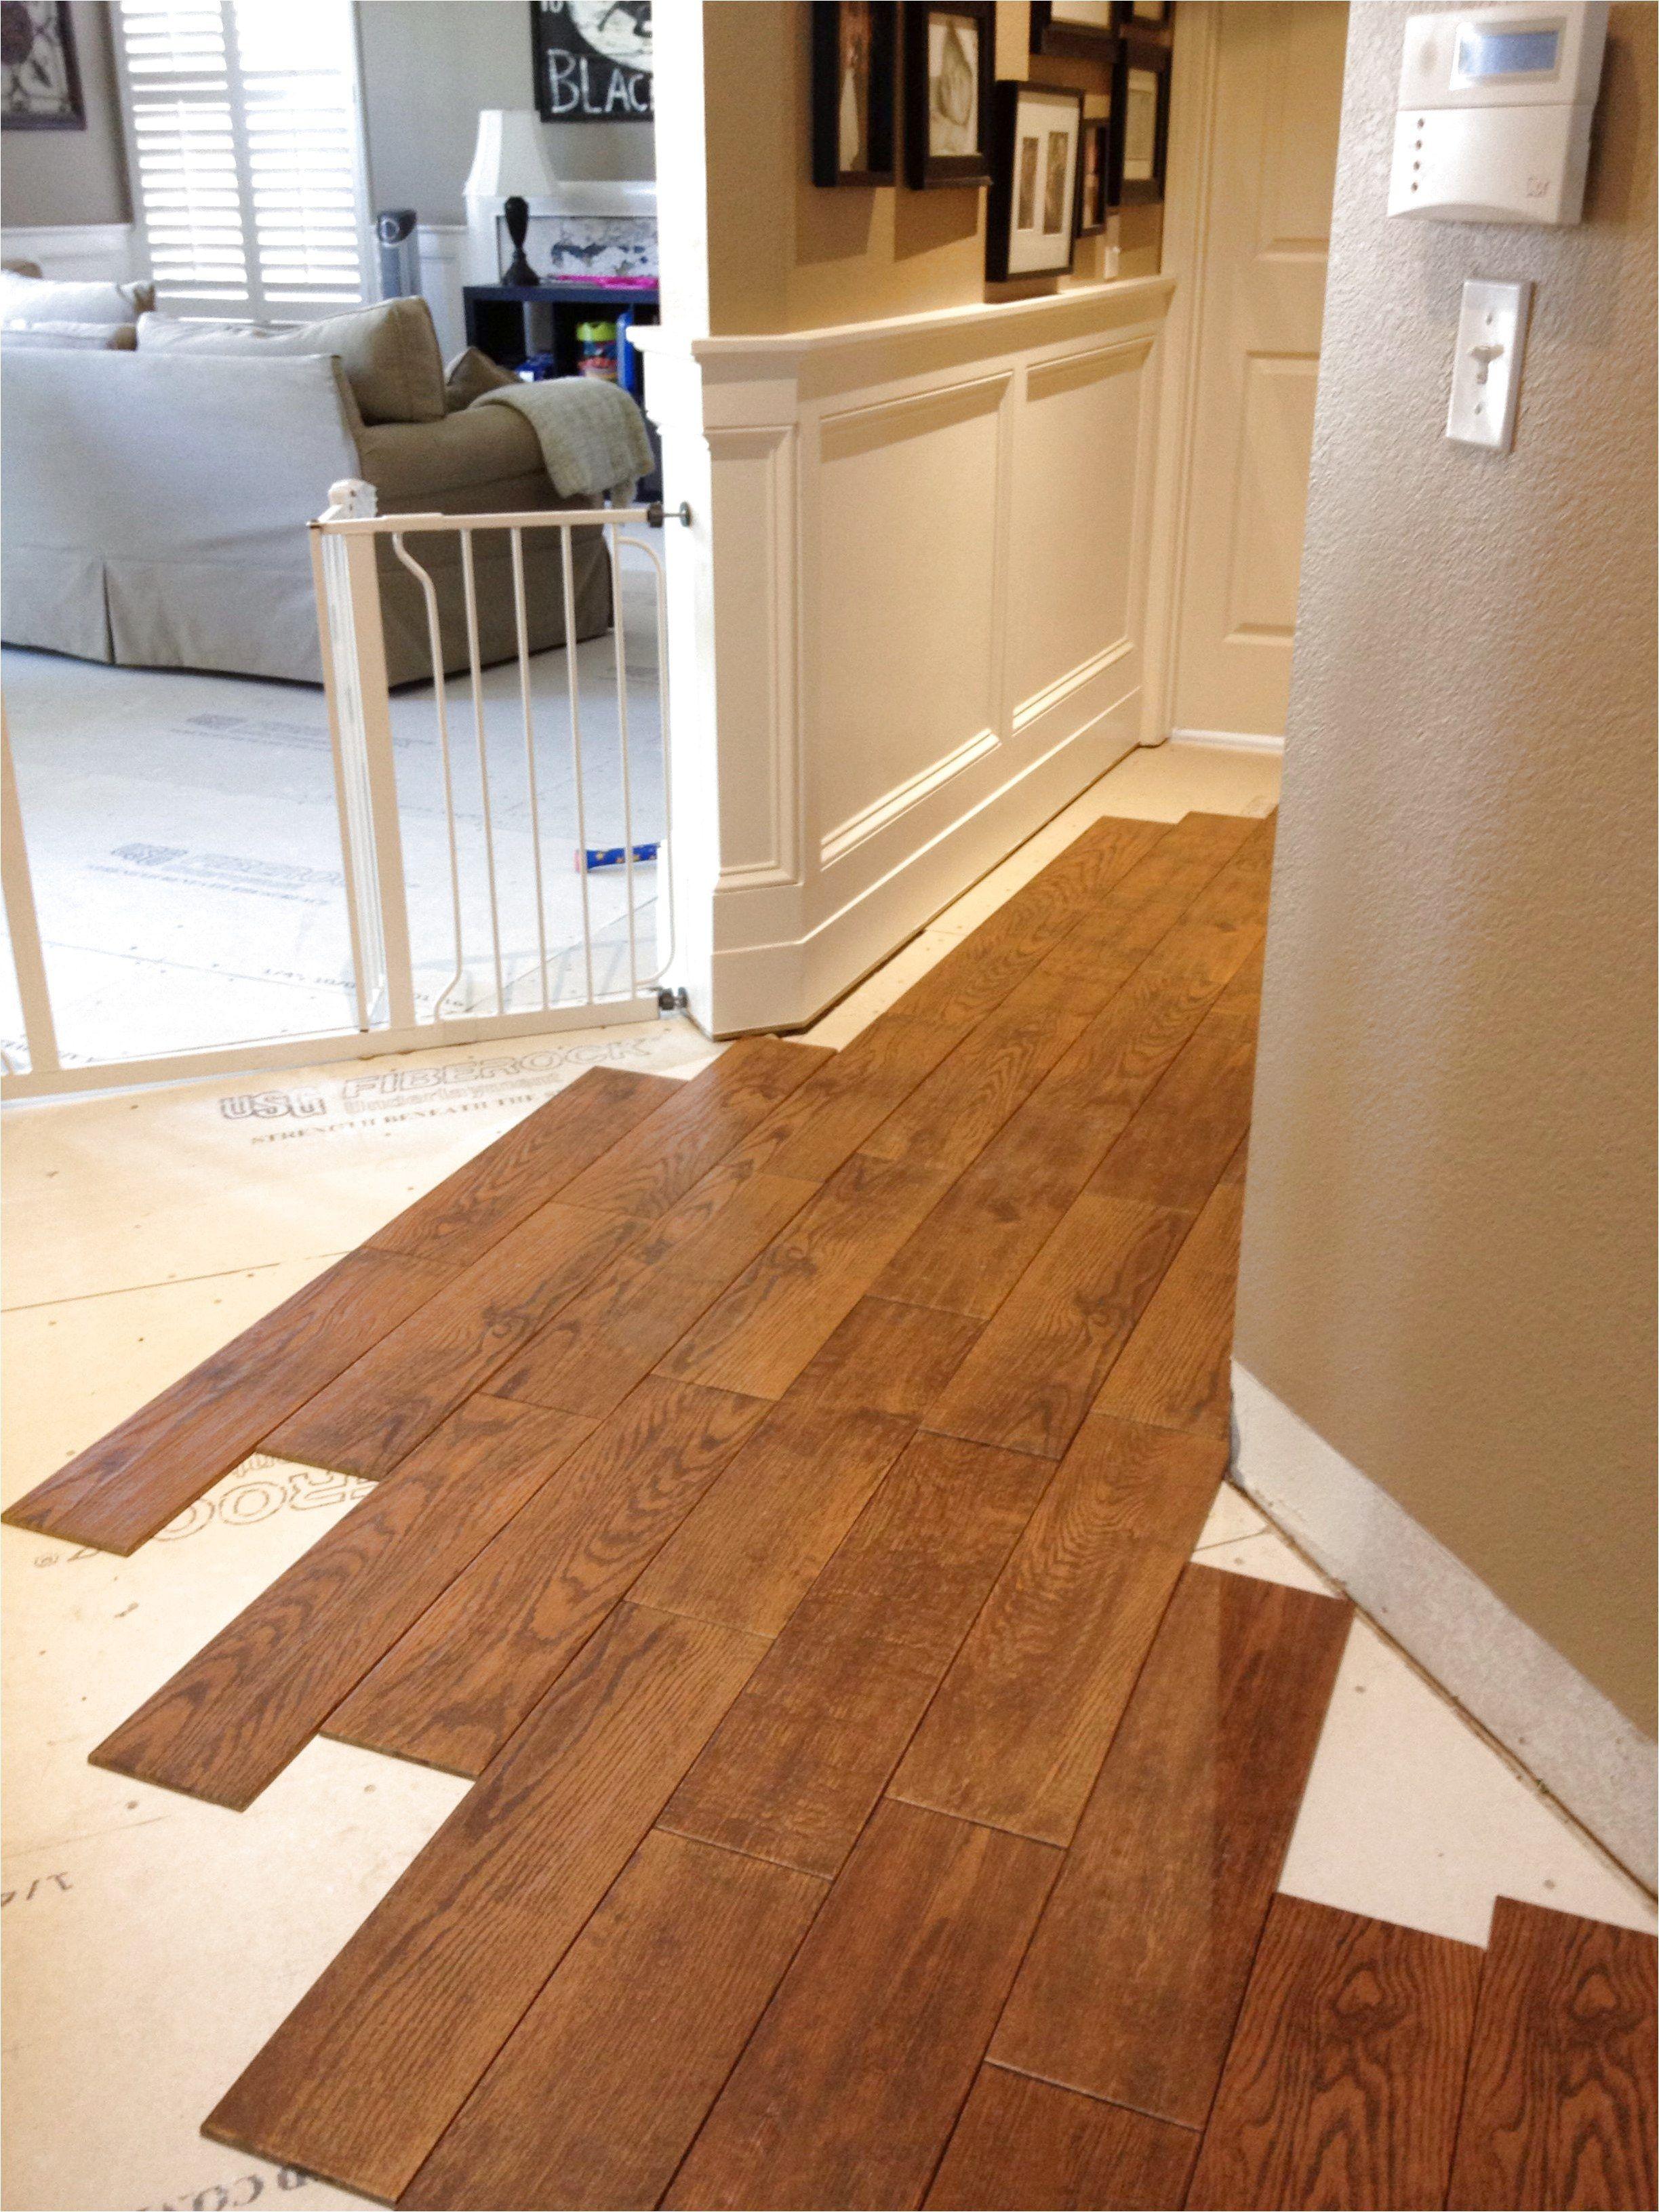 Different Designs For Your Floor Using Ceramics Flooring House Flooring Wood Look Tile